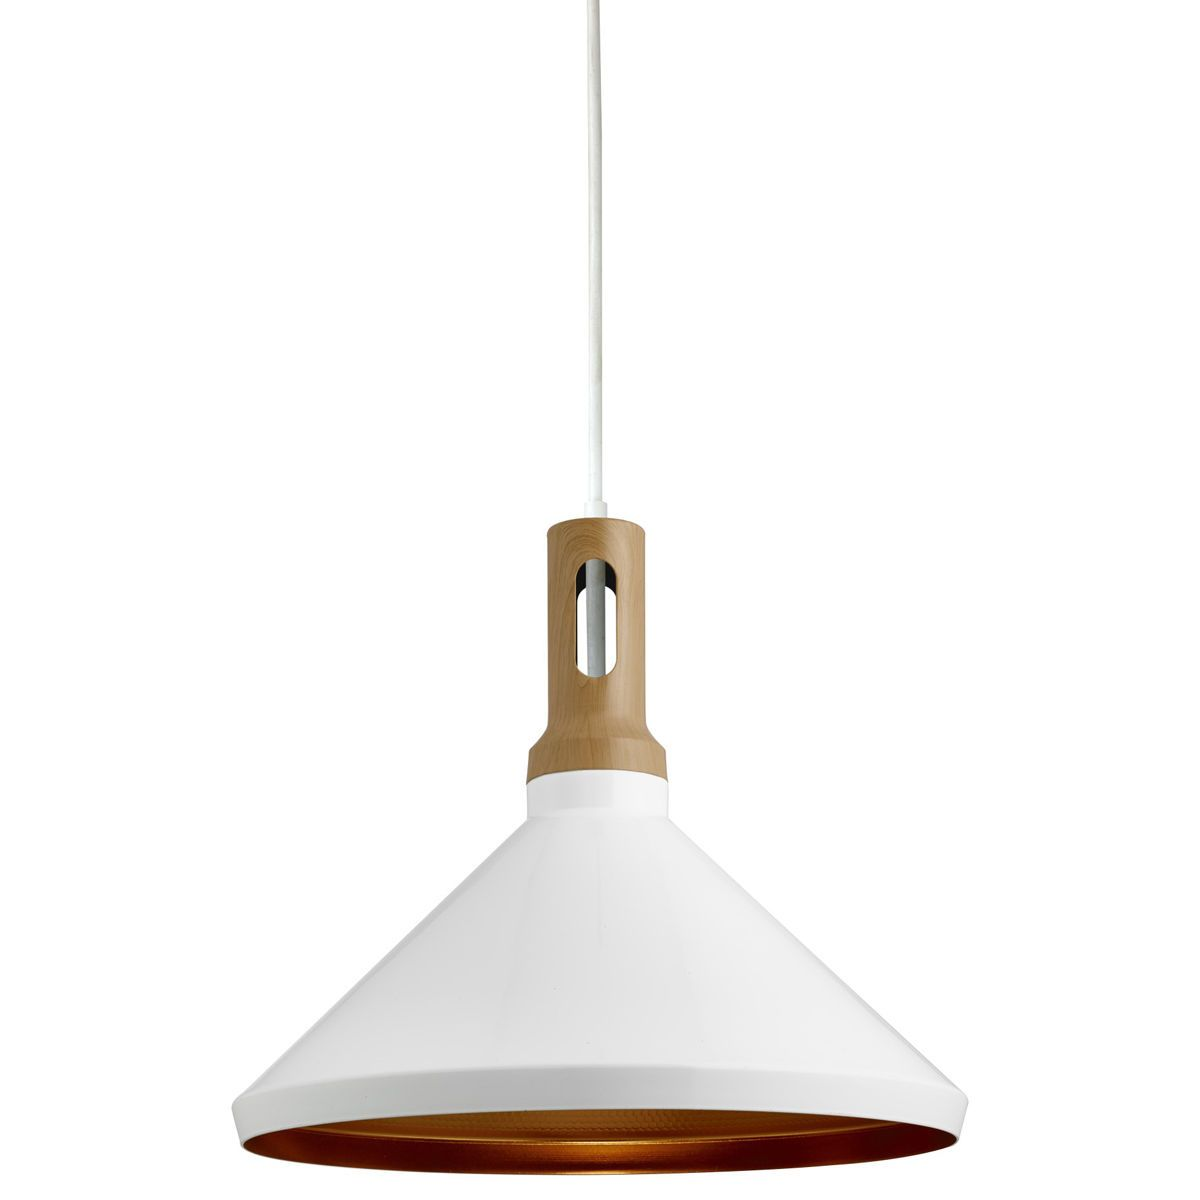 Wh cone white pendant light with gold inner from dushka ltd